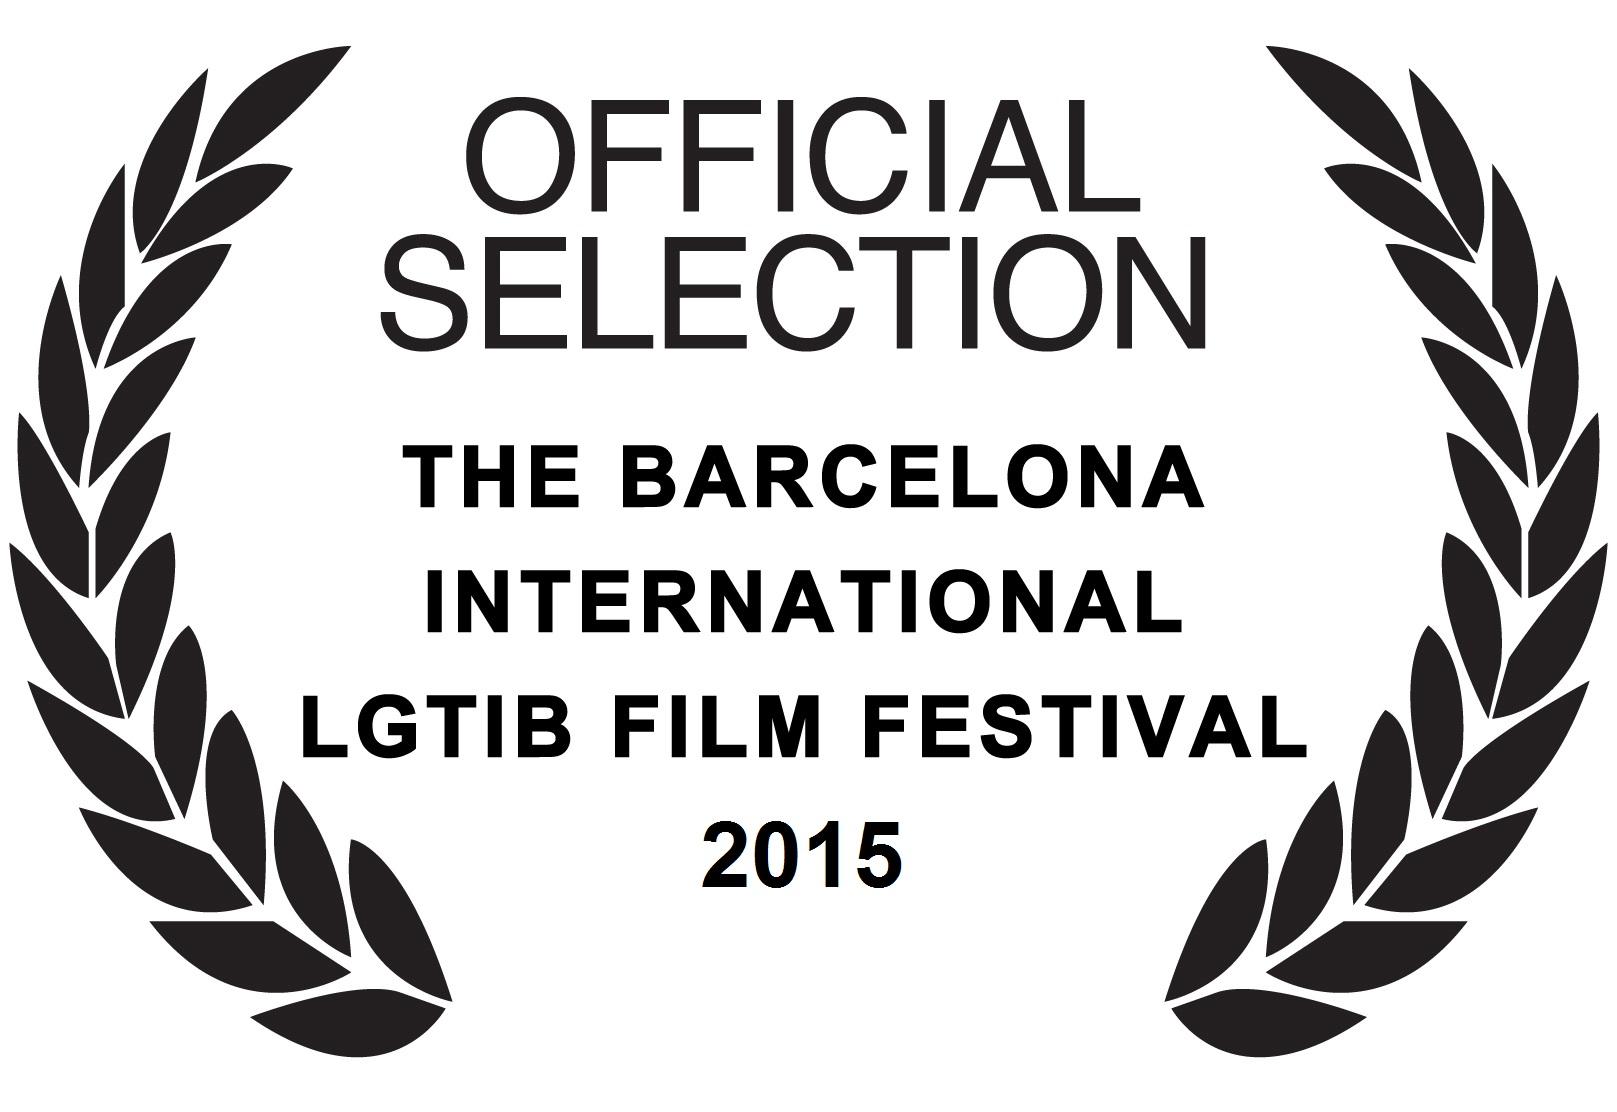 barcelonaintllgtibfilmfestvial